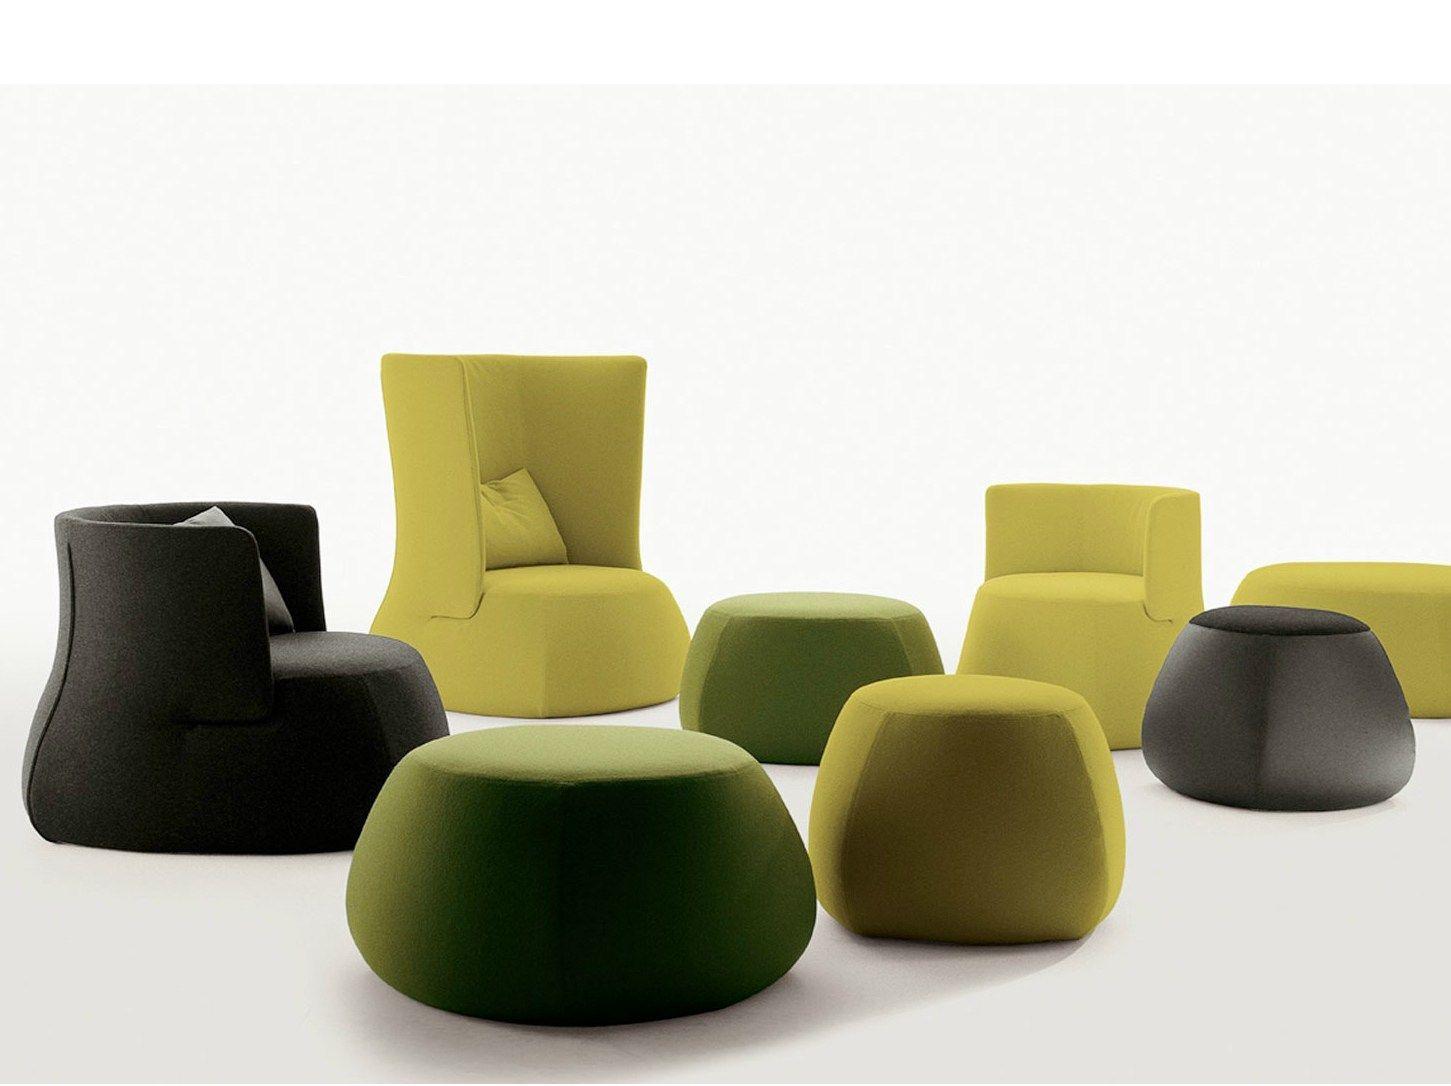 fat sofa pouf by b b italia design patricia urquiola. Black Bedroom Furniture Sets. Home Design Ideas